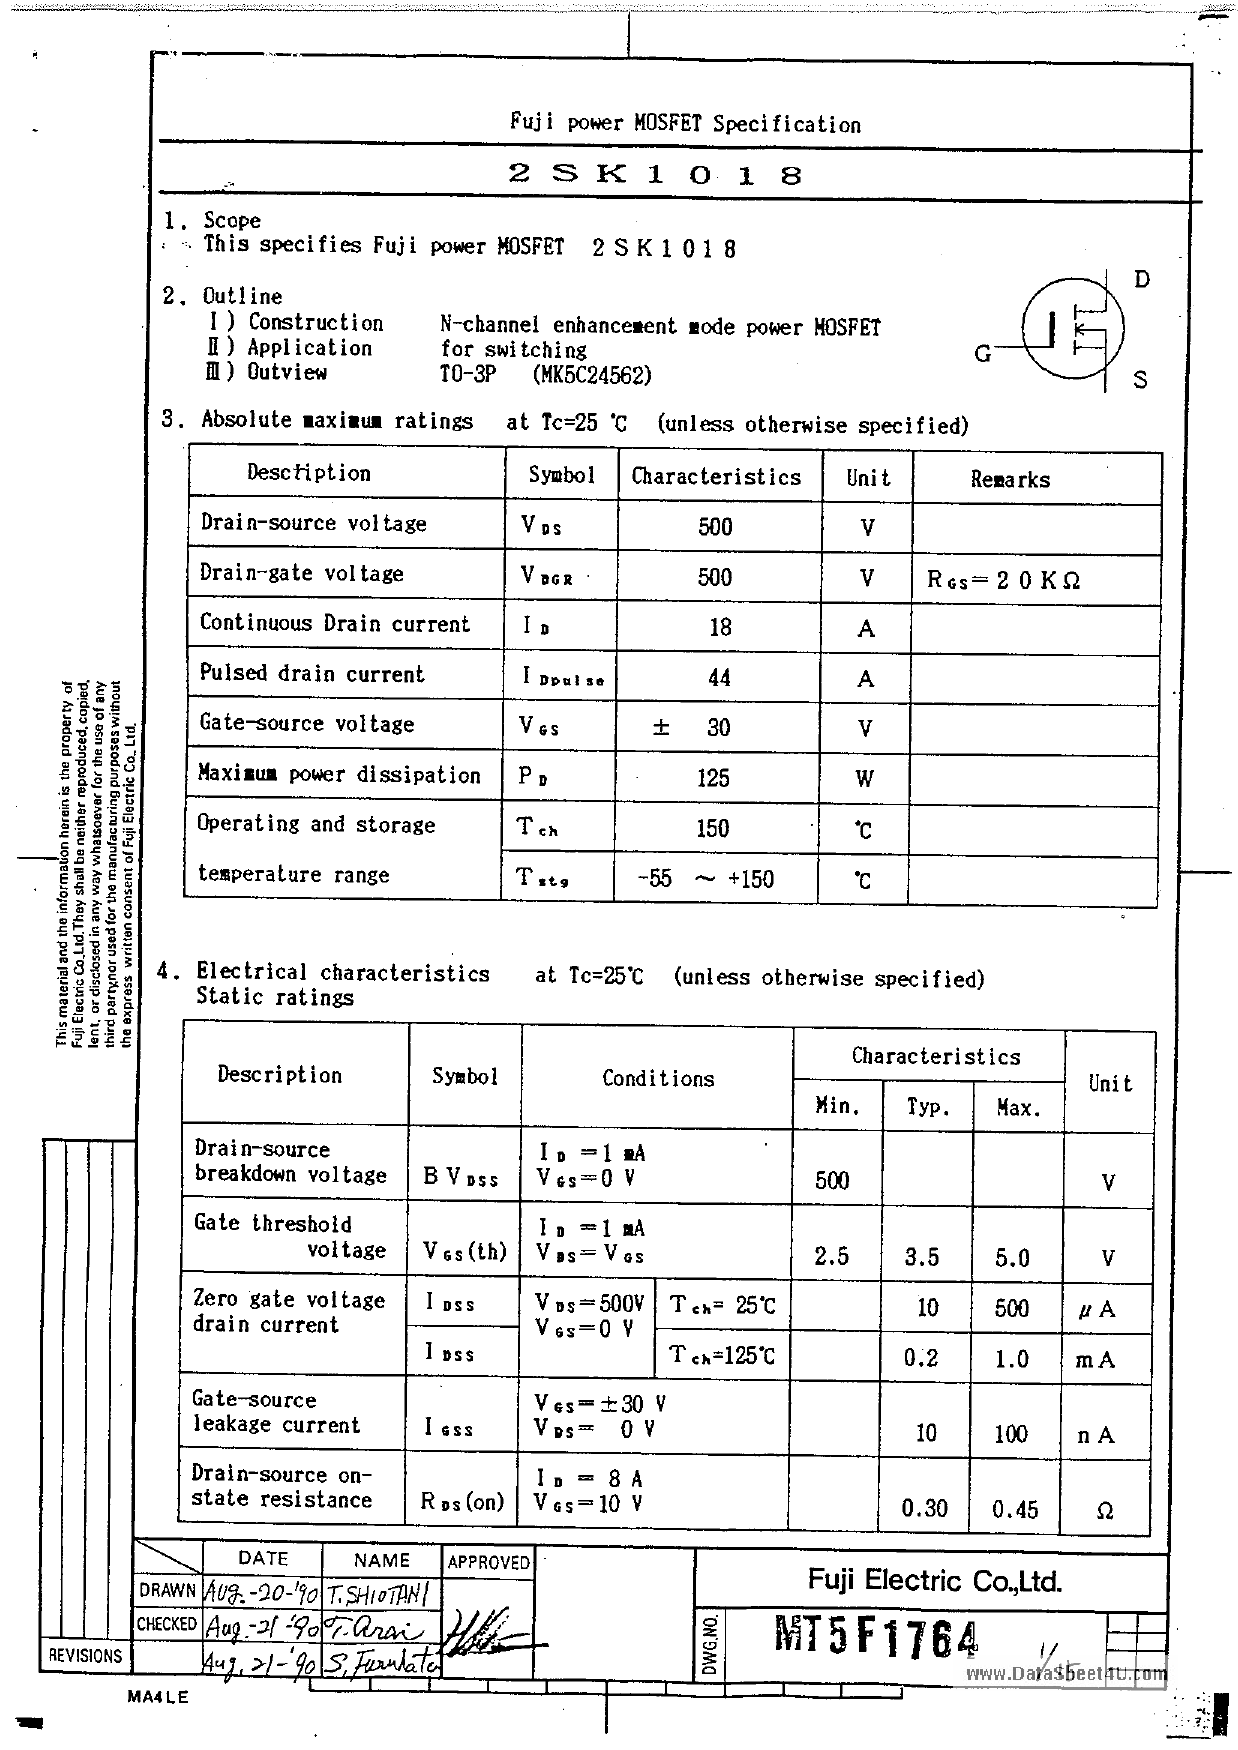 K1018 datasheet